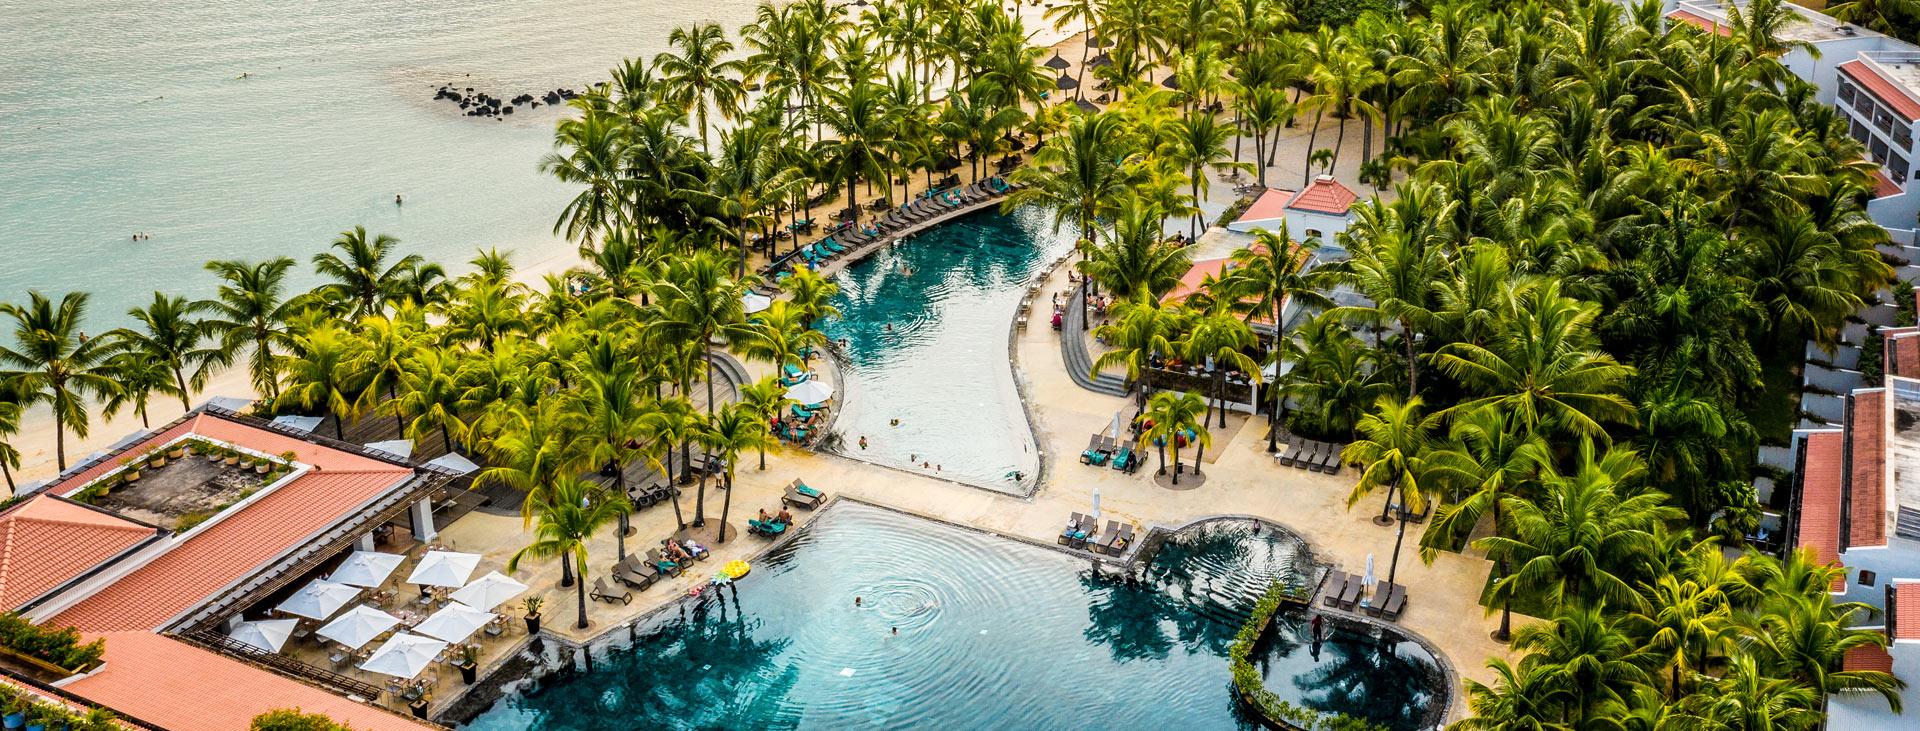 Mauricia Beachcomber Resort & Spa, Mauritius, Mauritius